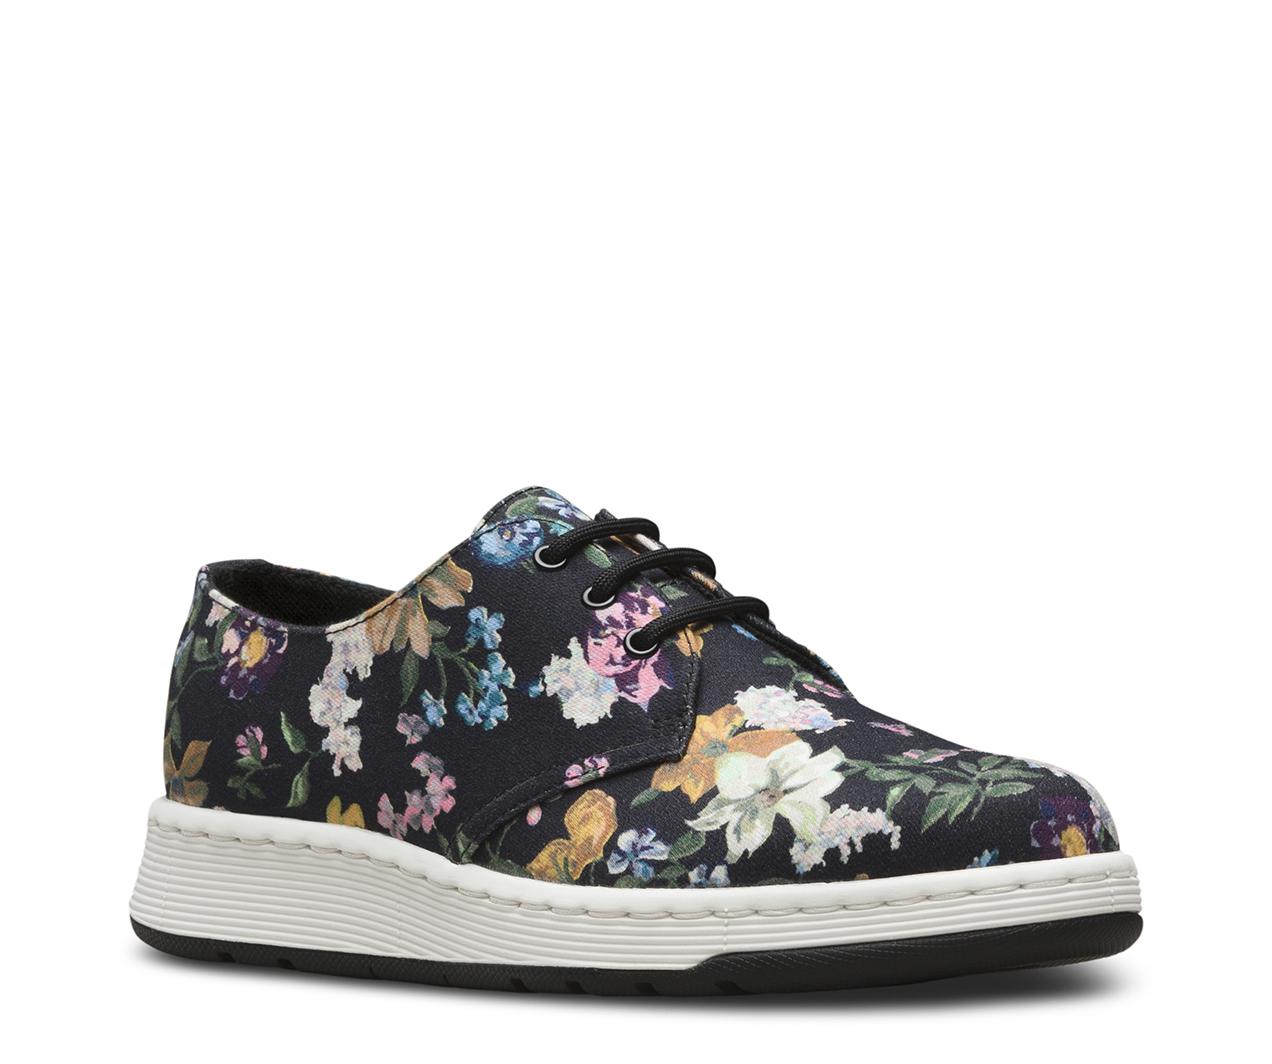 Dr. Martens Darcy Floral Cavendish 3-Eye Shoe niY1Ex